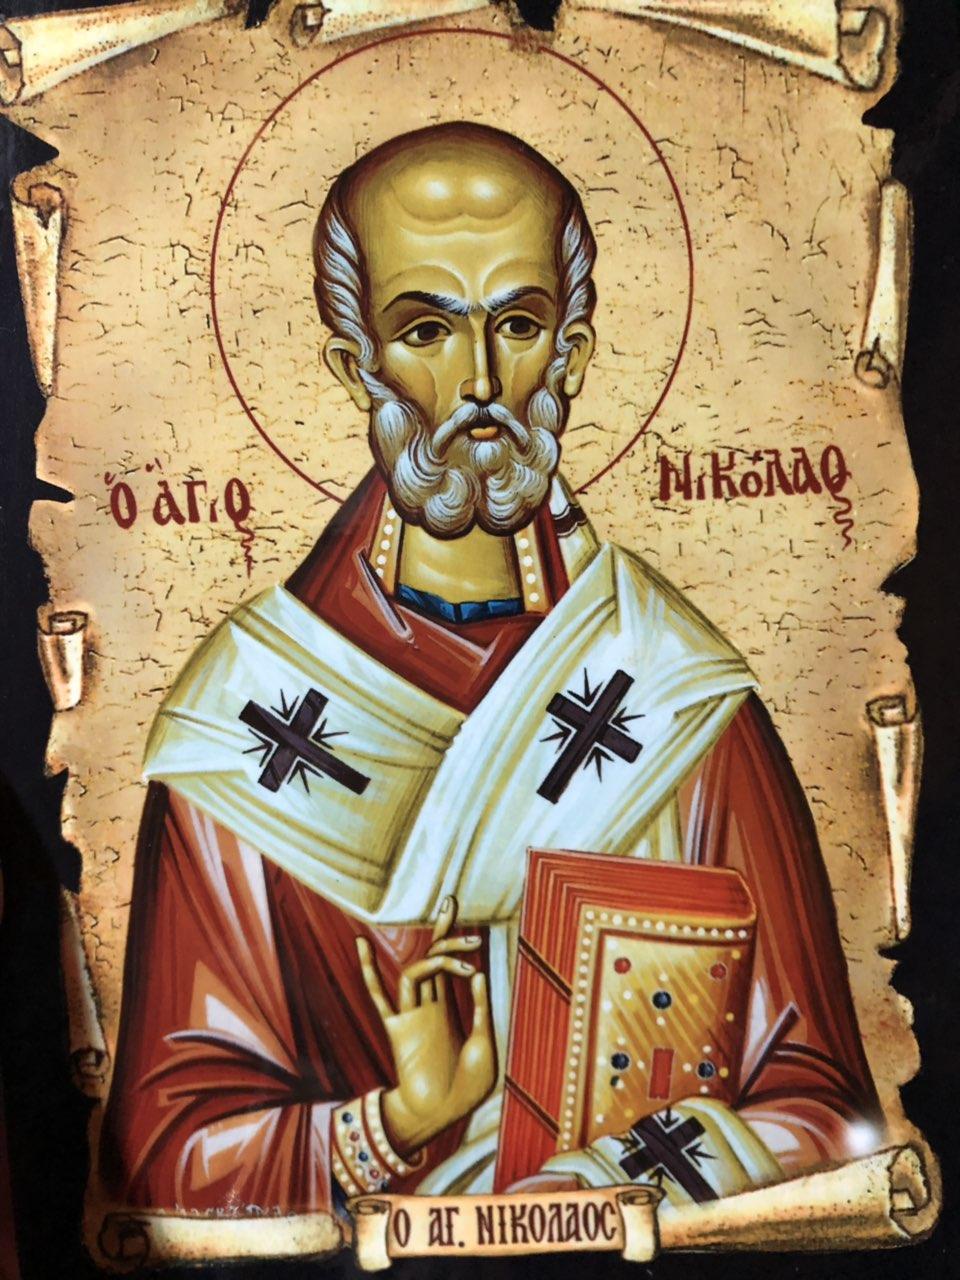 Sveti Nikola, foto: Redakcija ,,Knjaževačke novine'' / www.knjazevacke.rs